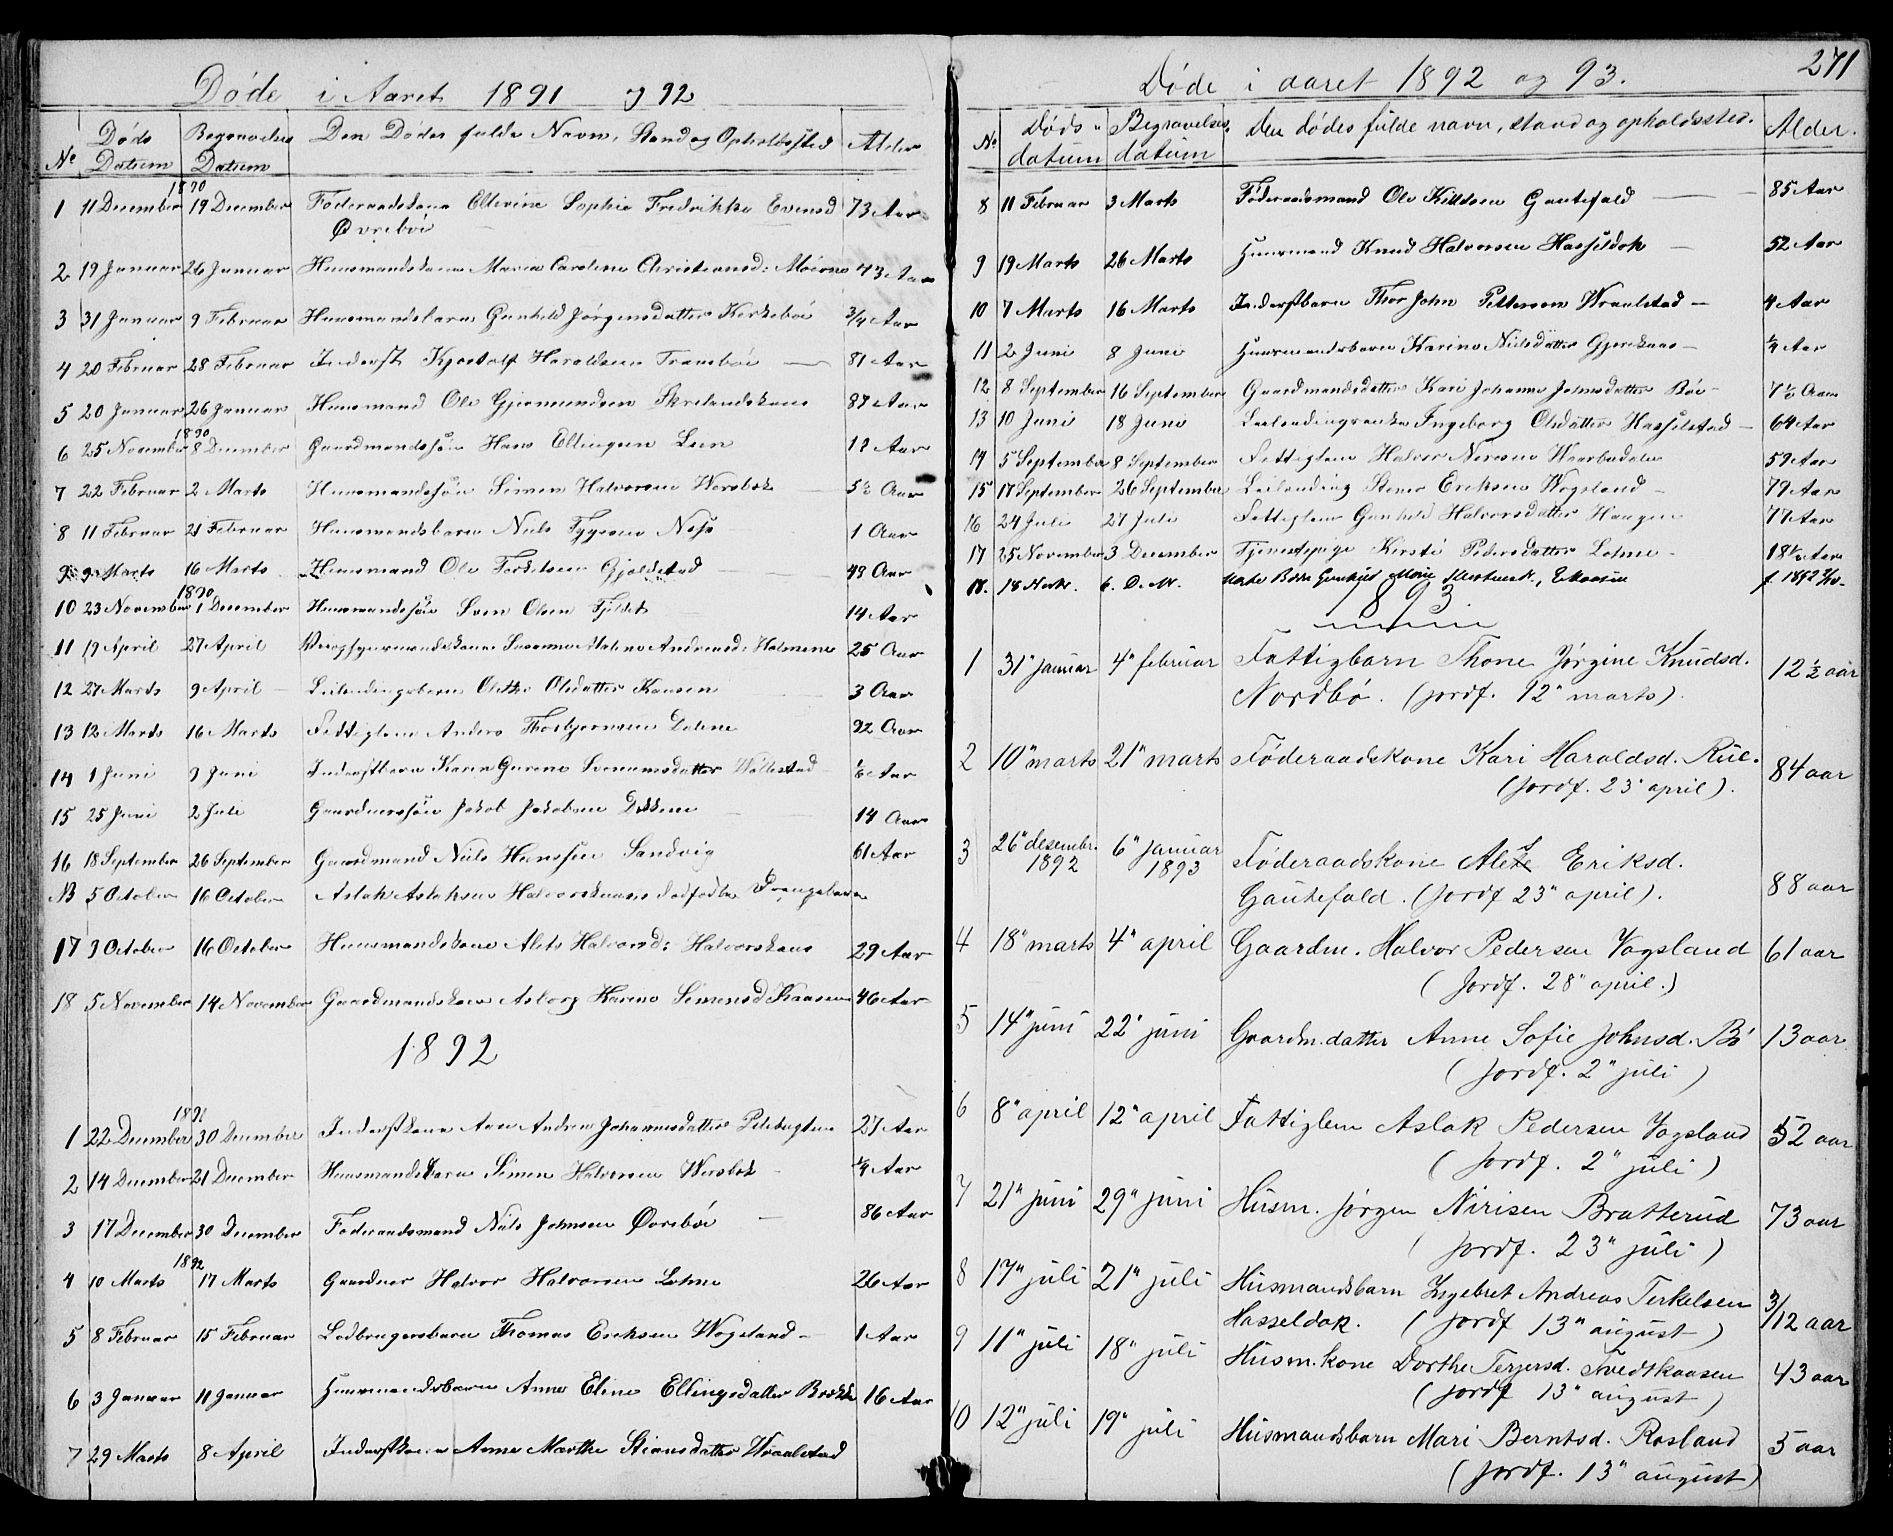 SAKO, Drangedal kirkebøker, G/Gb/L0001: Klokkerbok nr. II 1, 1856-1894, s. 271